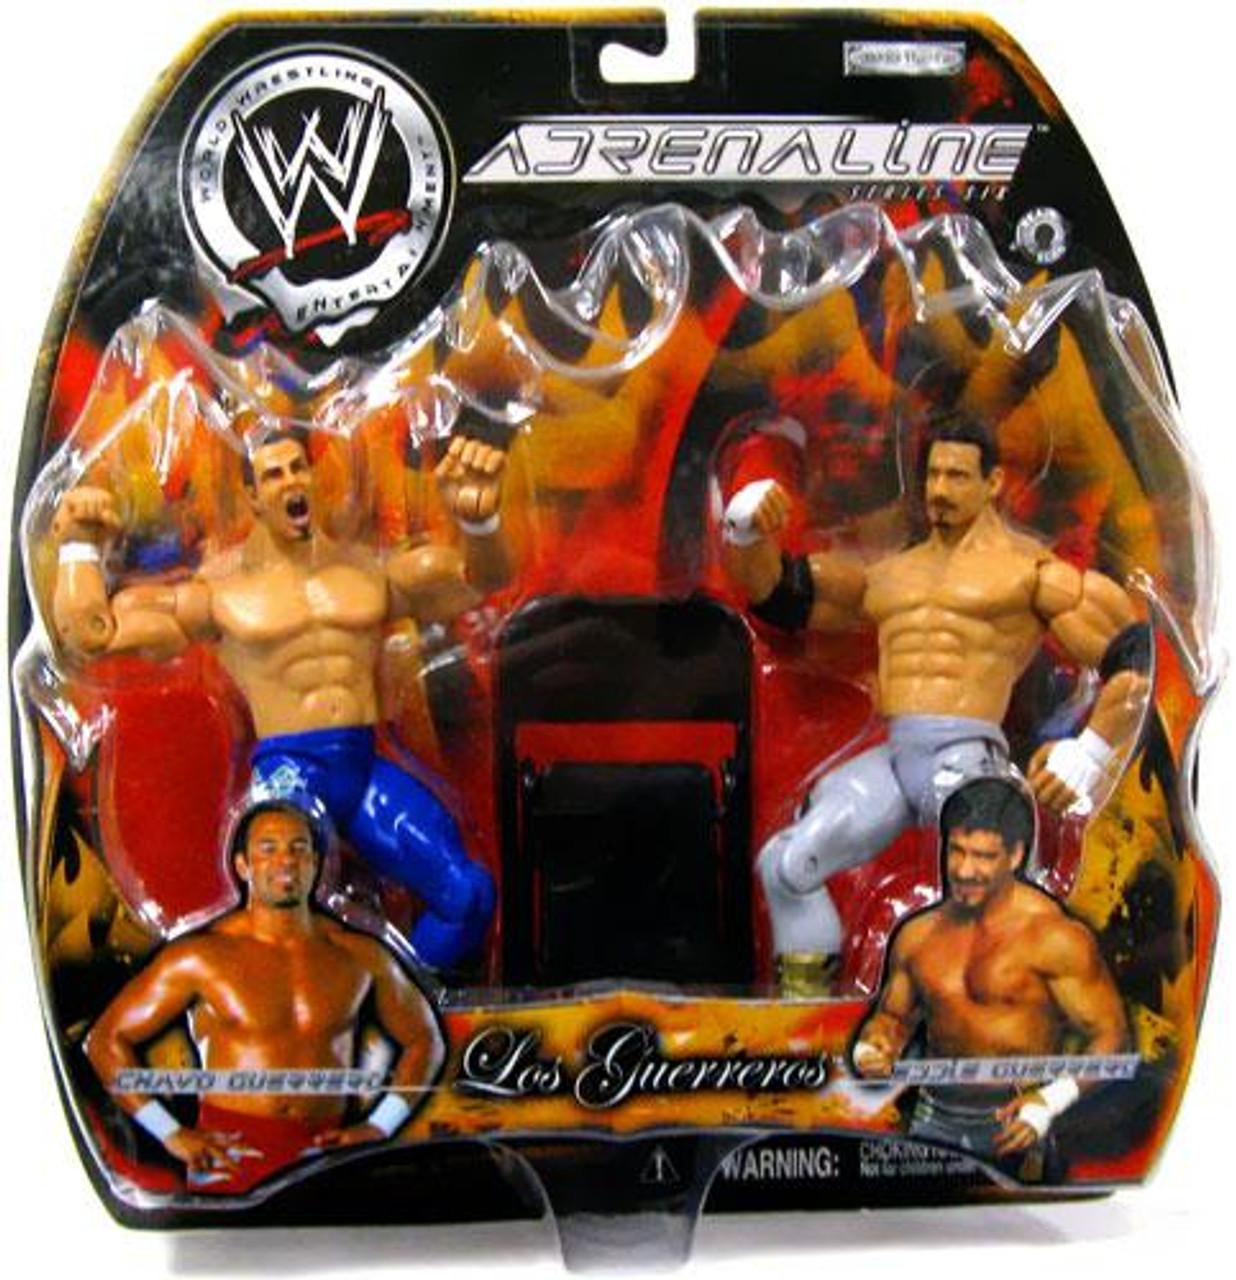 WWE Wrestling Adrenaline Series 6 Los Guerreros Eddie Guerrero & Chavo Guerrero Action Figure 2-Pack